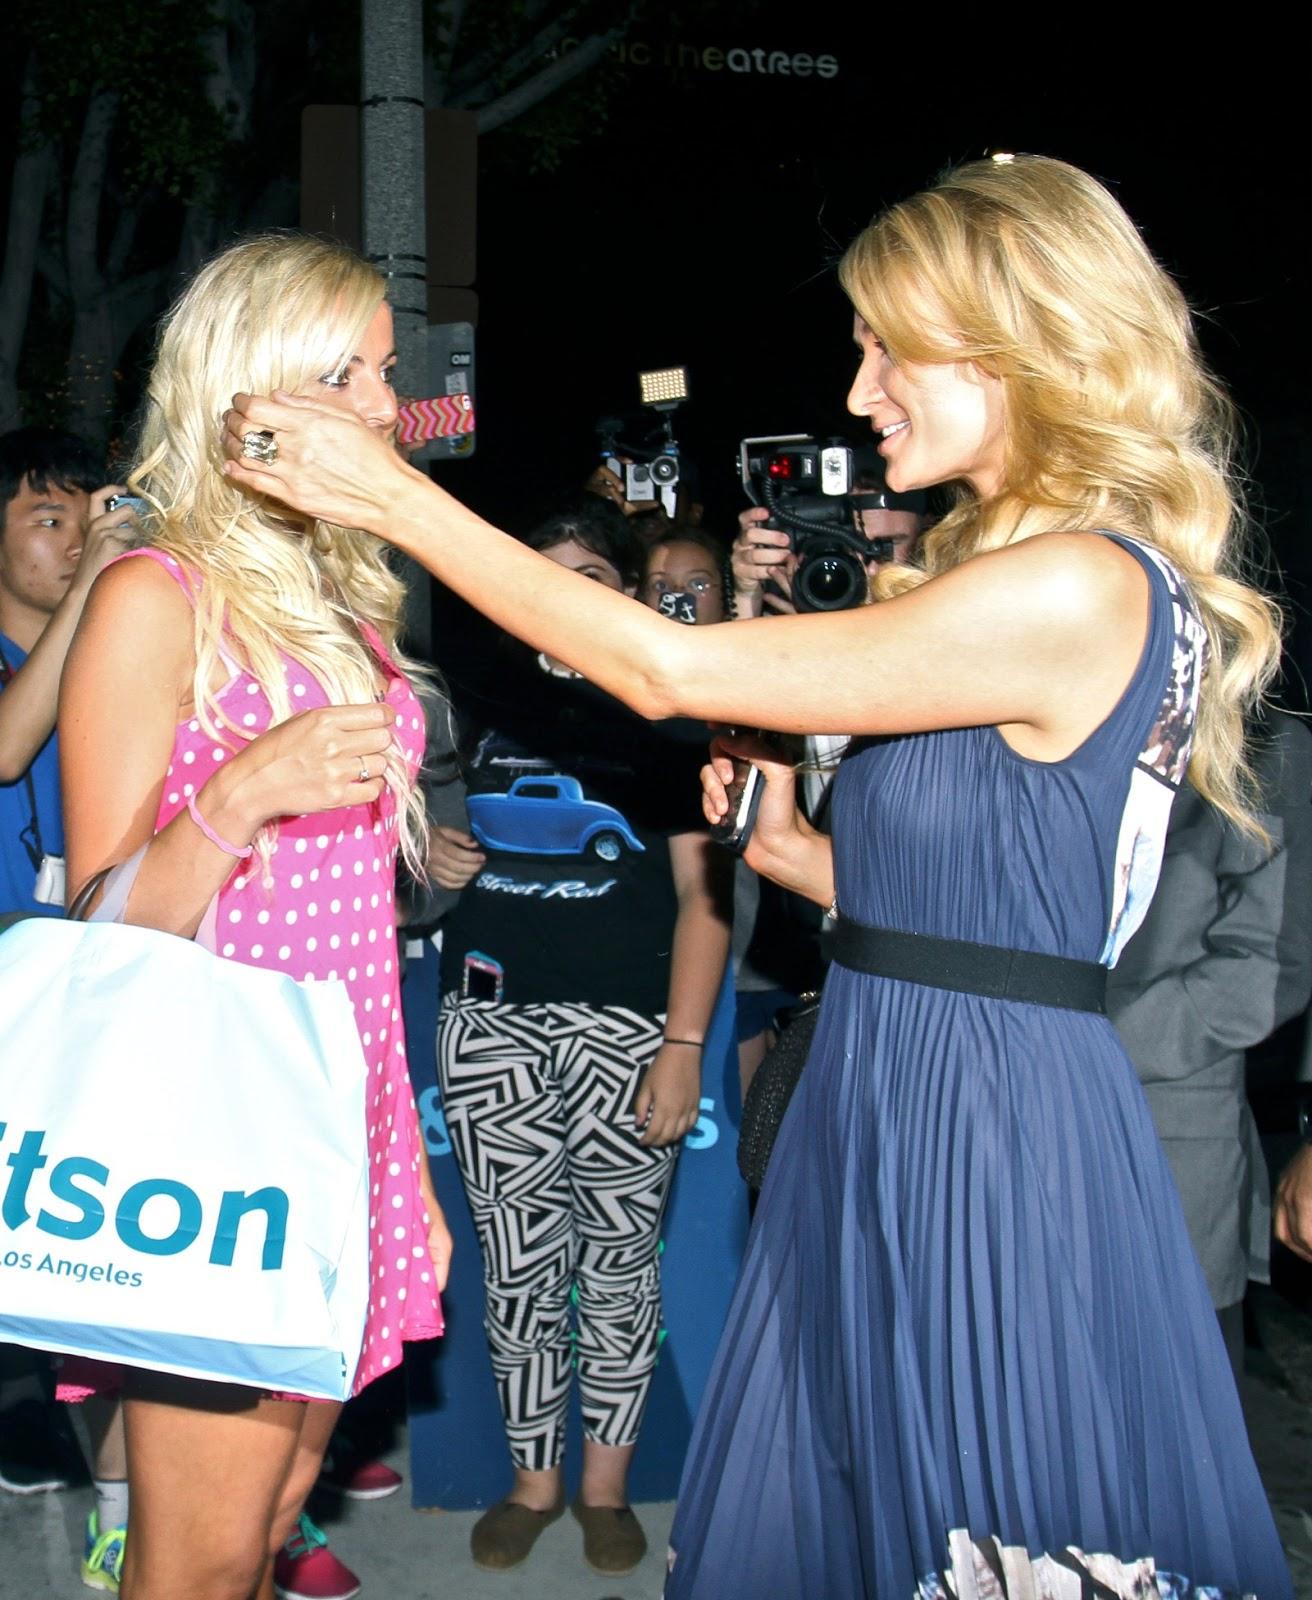 Hot Celebs Pictures: Paris Hilton - Braless See-Through